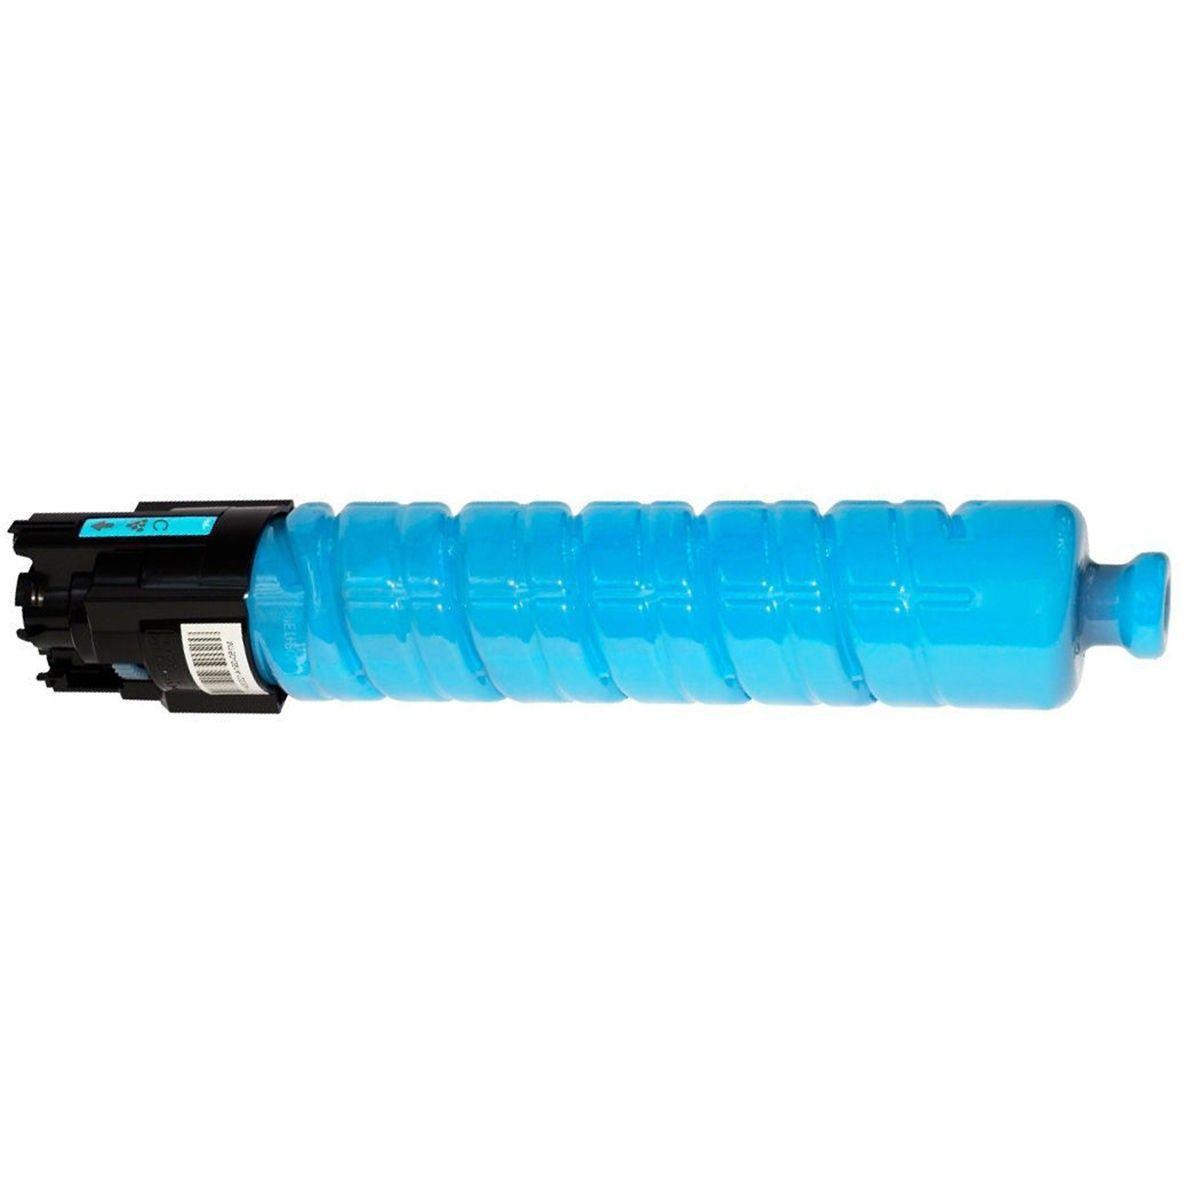 Compatível: Toner C430C para Ricoh Aficio SPC430 C431 C430dn C440dn SPC430 SPC431 SPC430dn SPC431dn / Ciano / 21.000